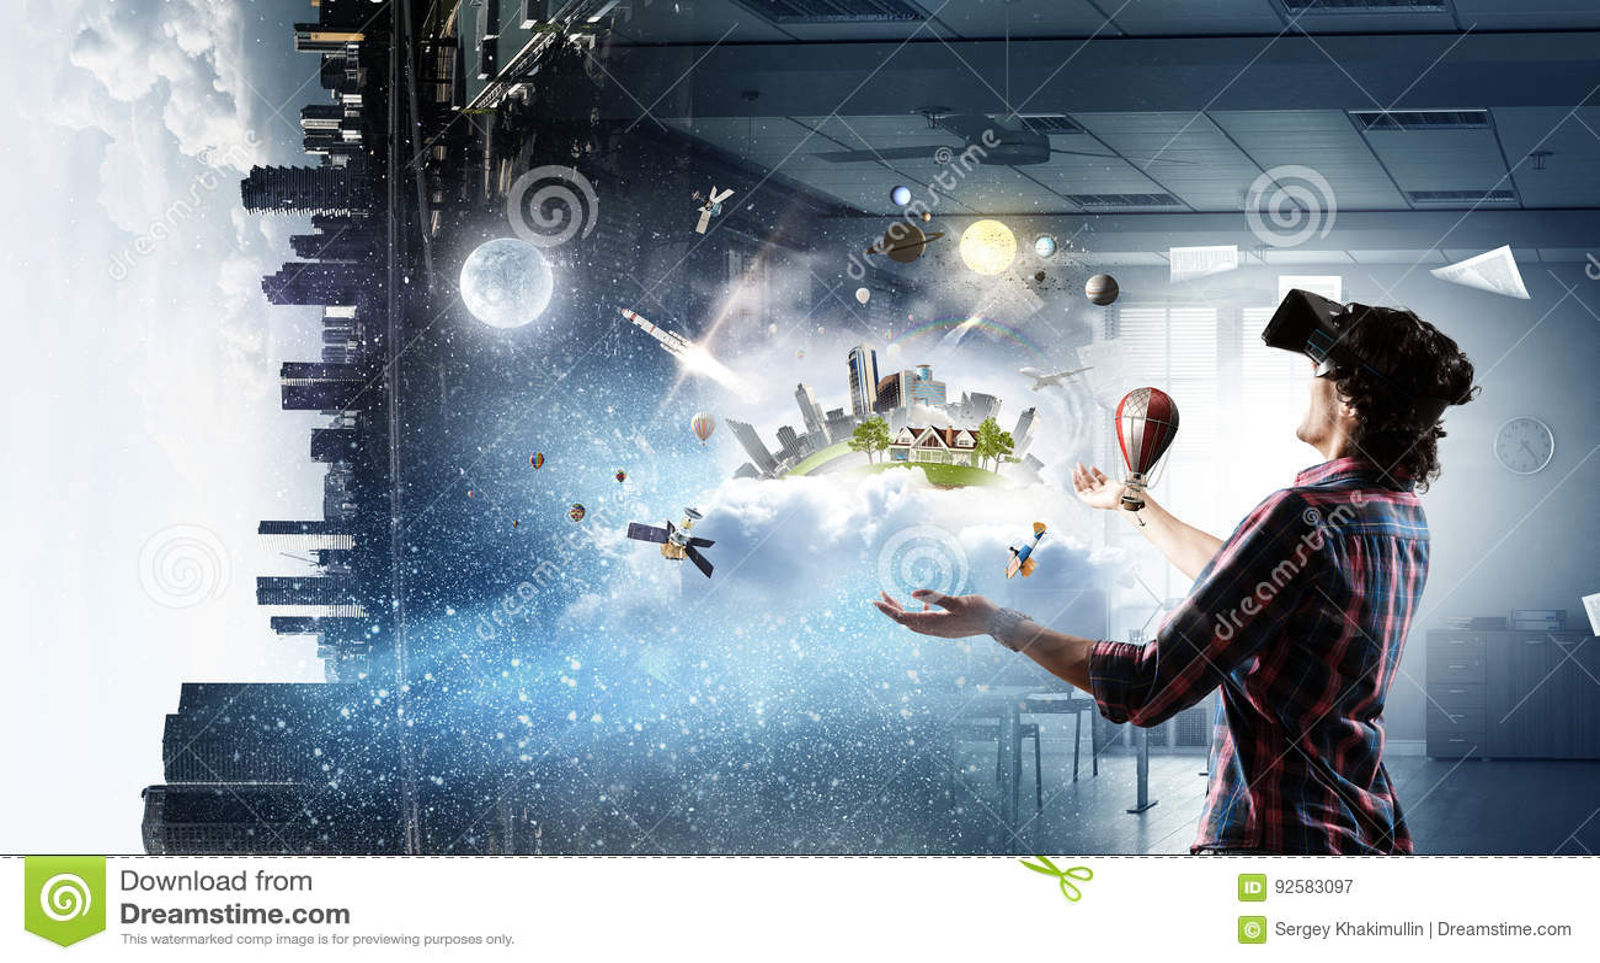 Most impressive entertainment technologies. Mixed media